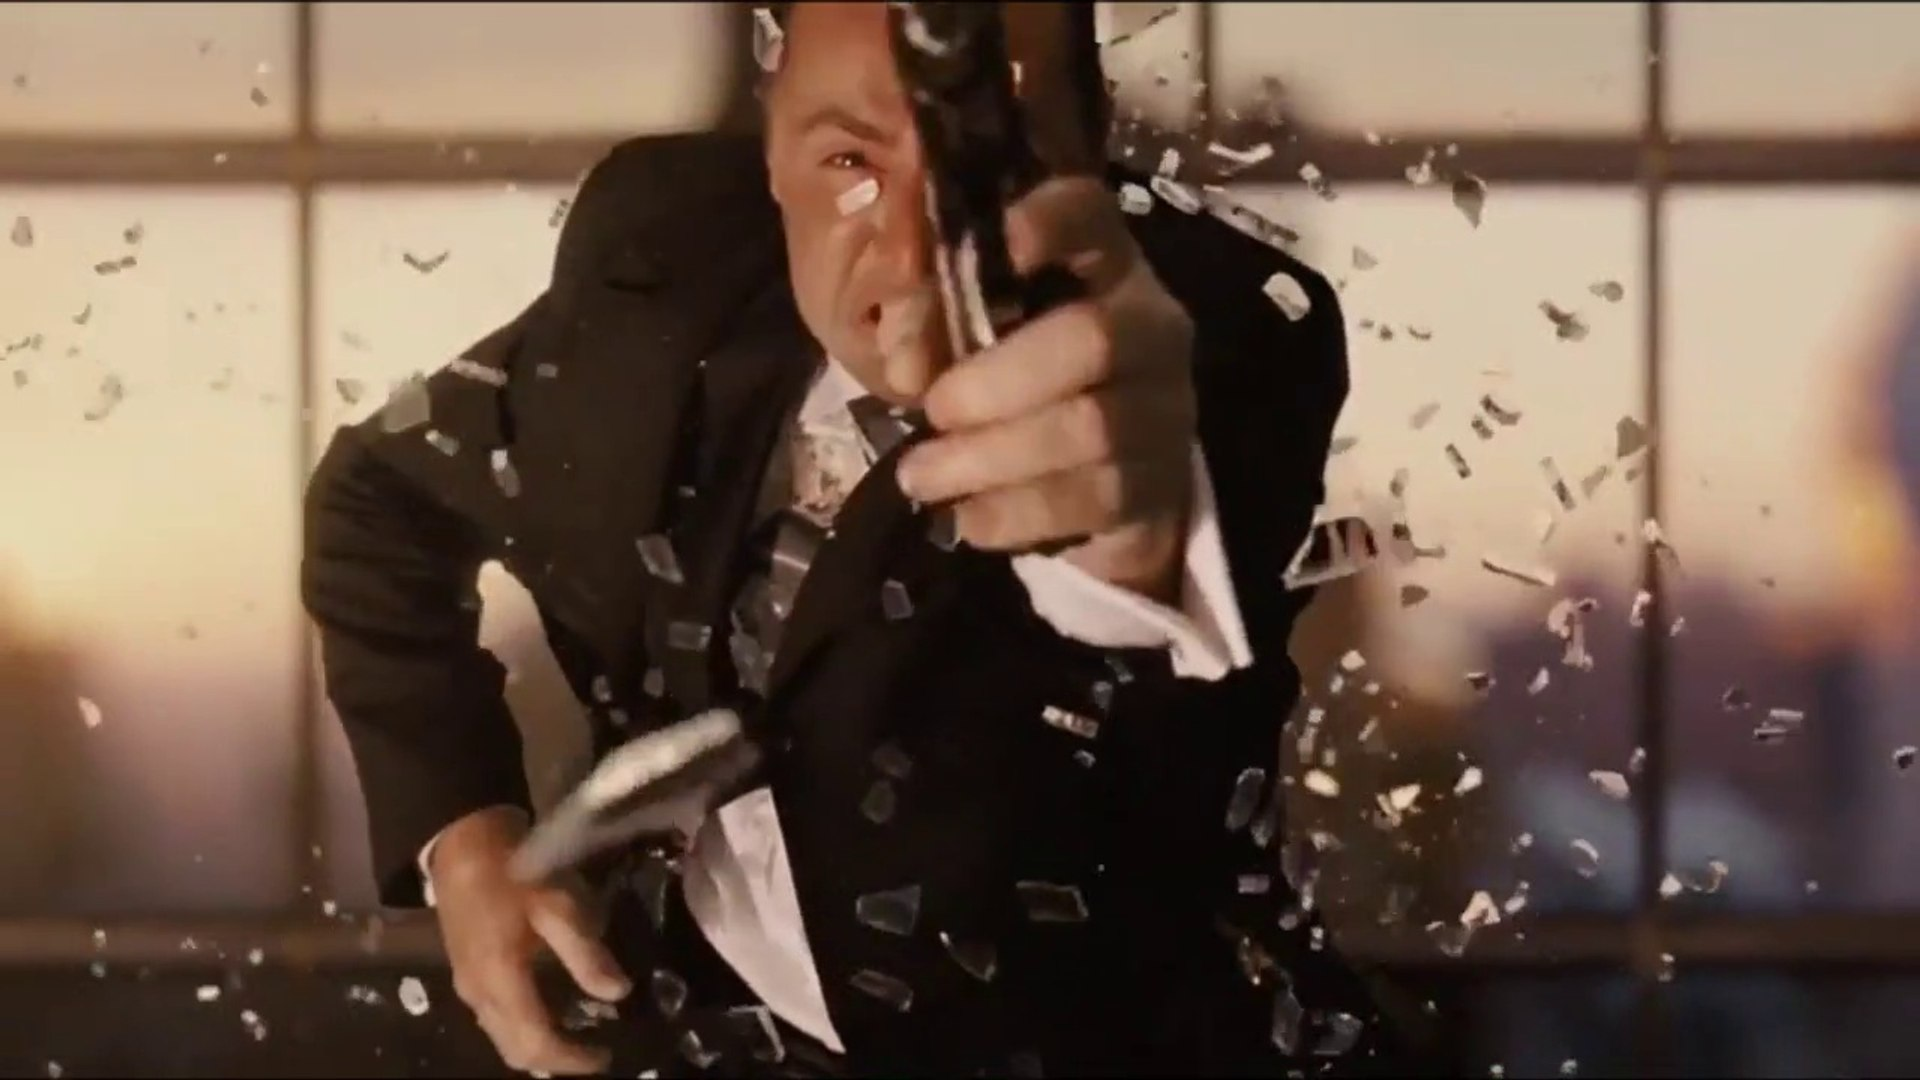 Wanted - Aksiyon Sahneleri izle 1 - Aksiyon filmleri - Gull film izle - Full Action Movies